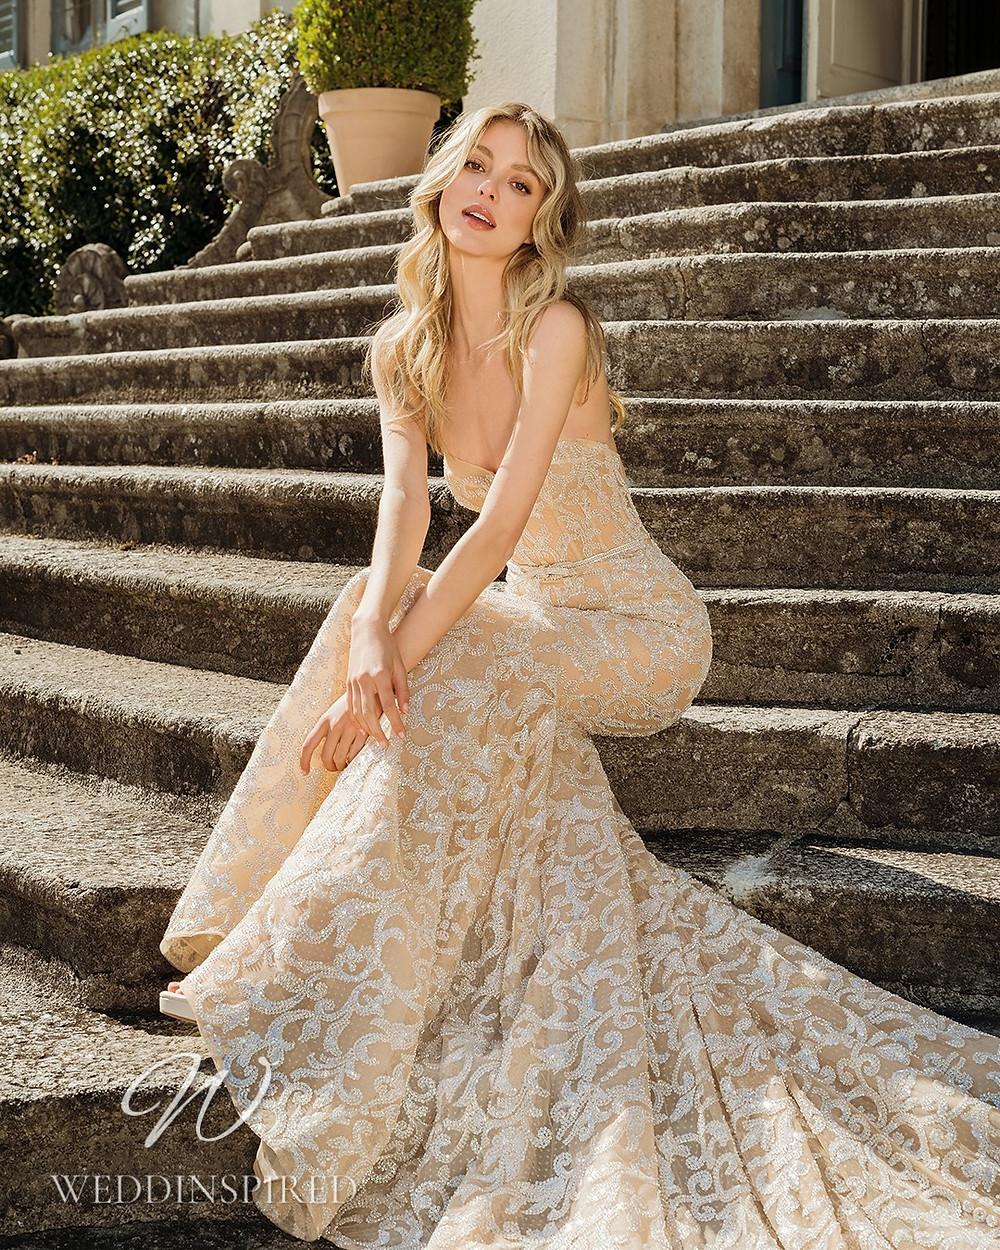 A Berta 2022 strapless blush mermaid wedding dress